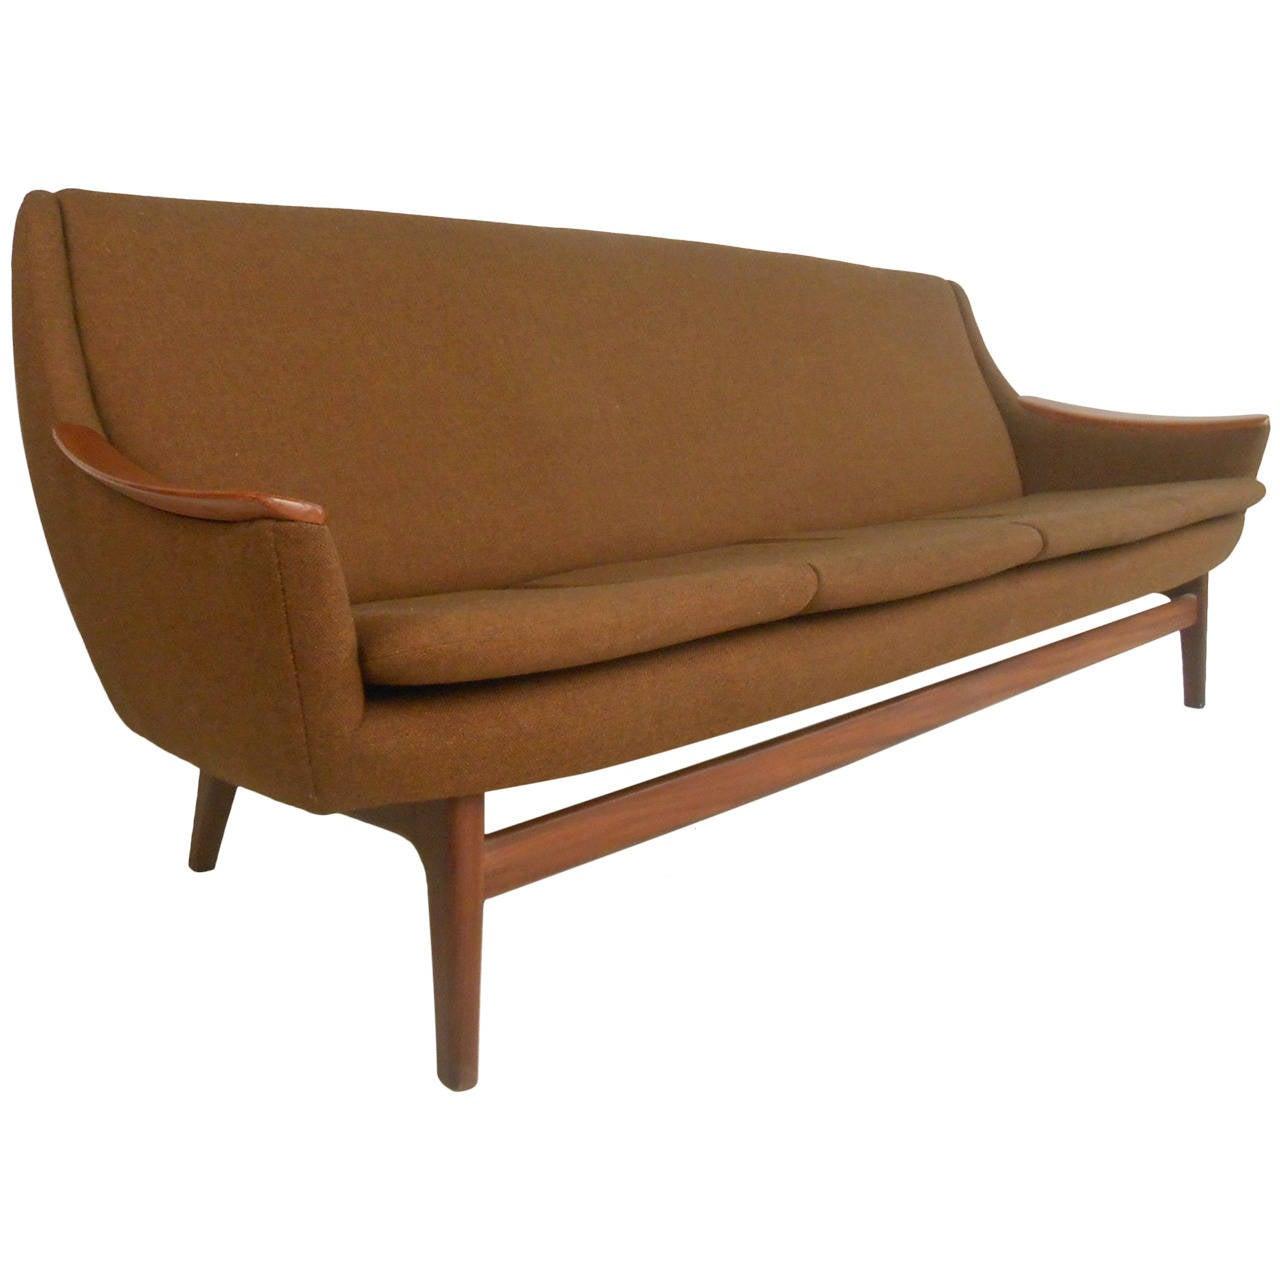 Sculptural danish modern sofa at 1stdibs for Danish modern furniture